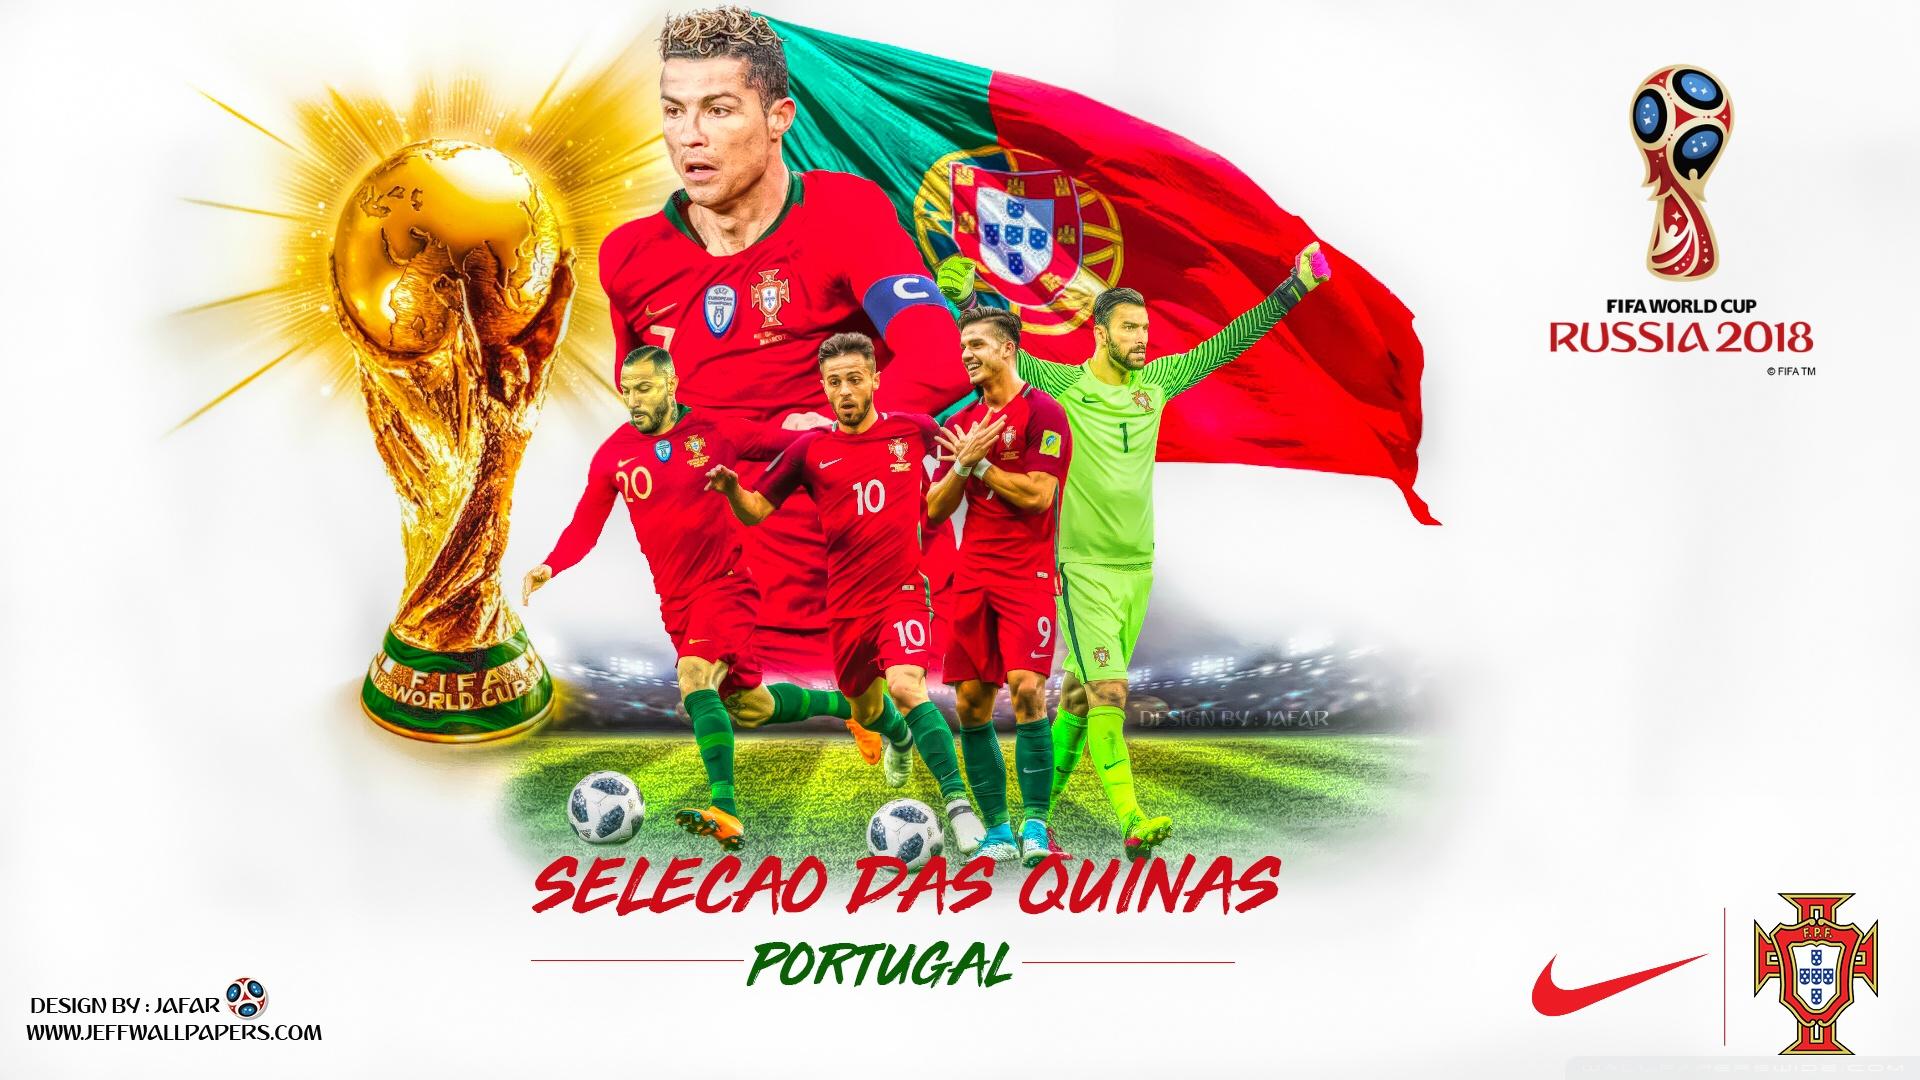 Ronaldo Hd Wallpapers Football Portugal World Cup 2018 4k Hd Desktop Wallpaper For 4k